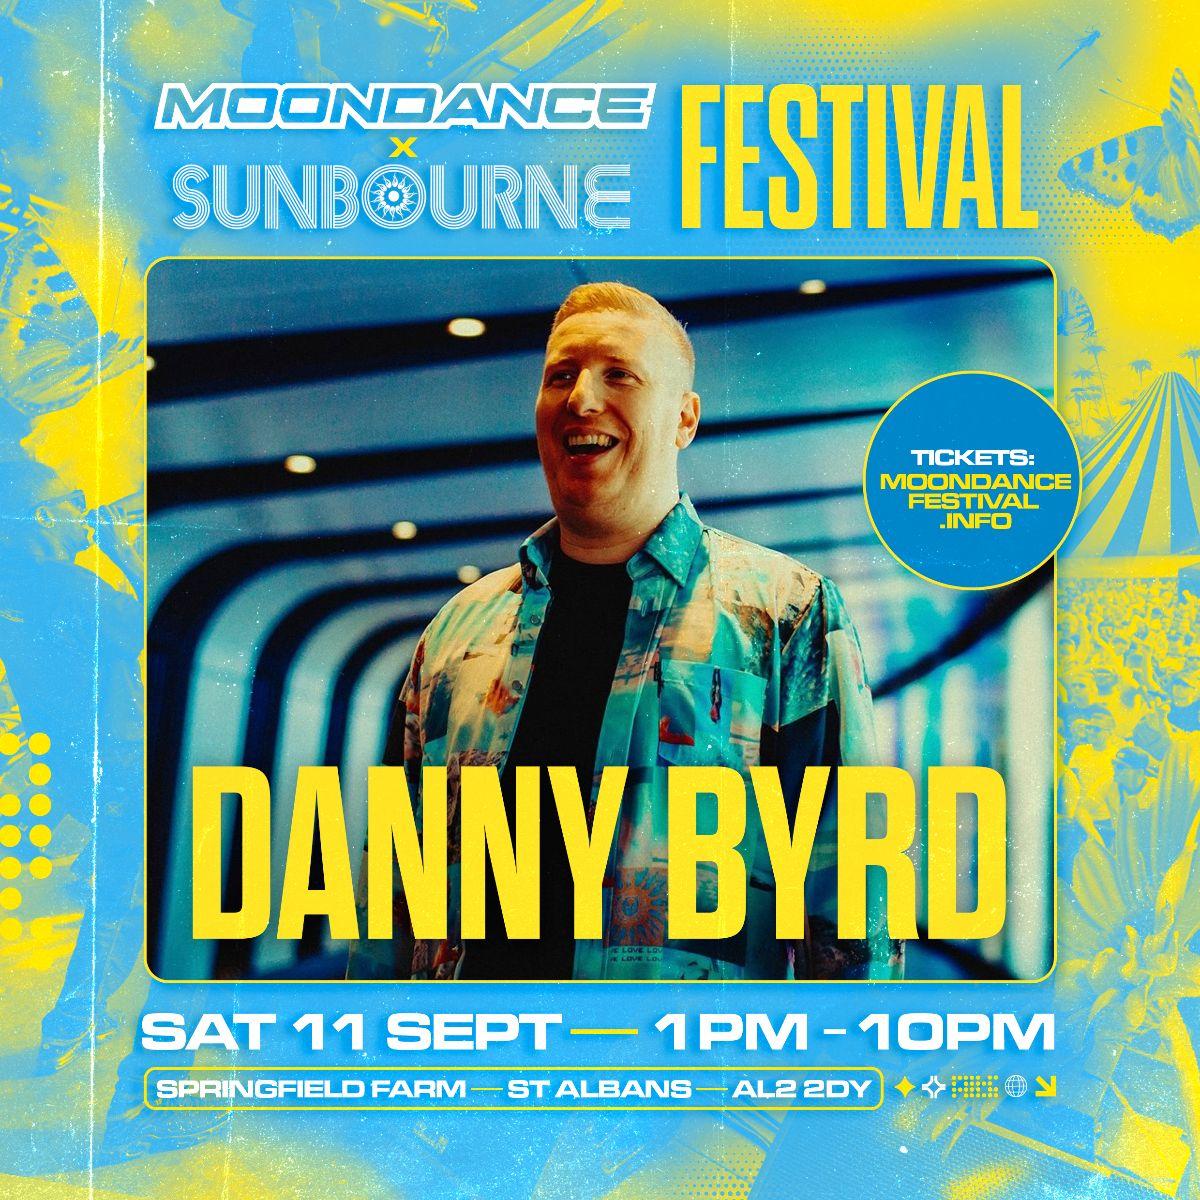 Moondance Festival: Danny Byrd announced 1